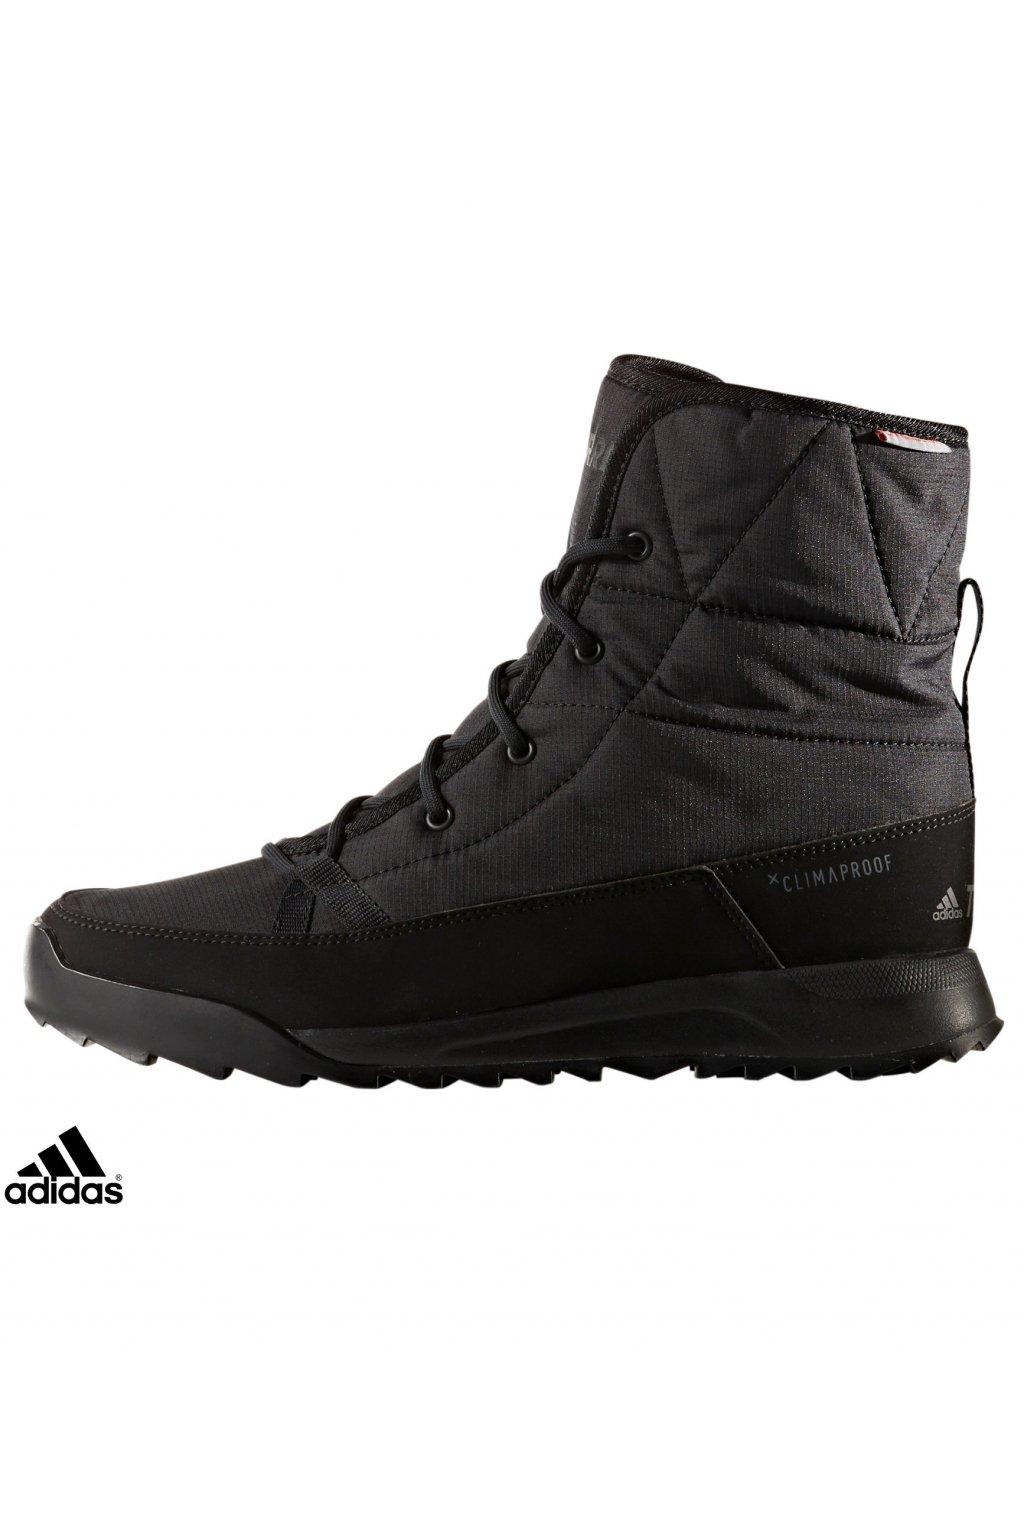 s80748 damske zimne cizmy adidas terrex choleah padded